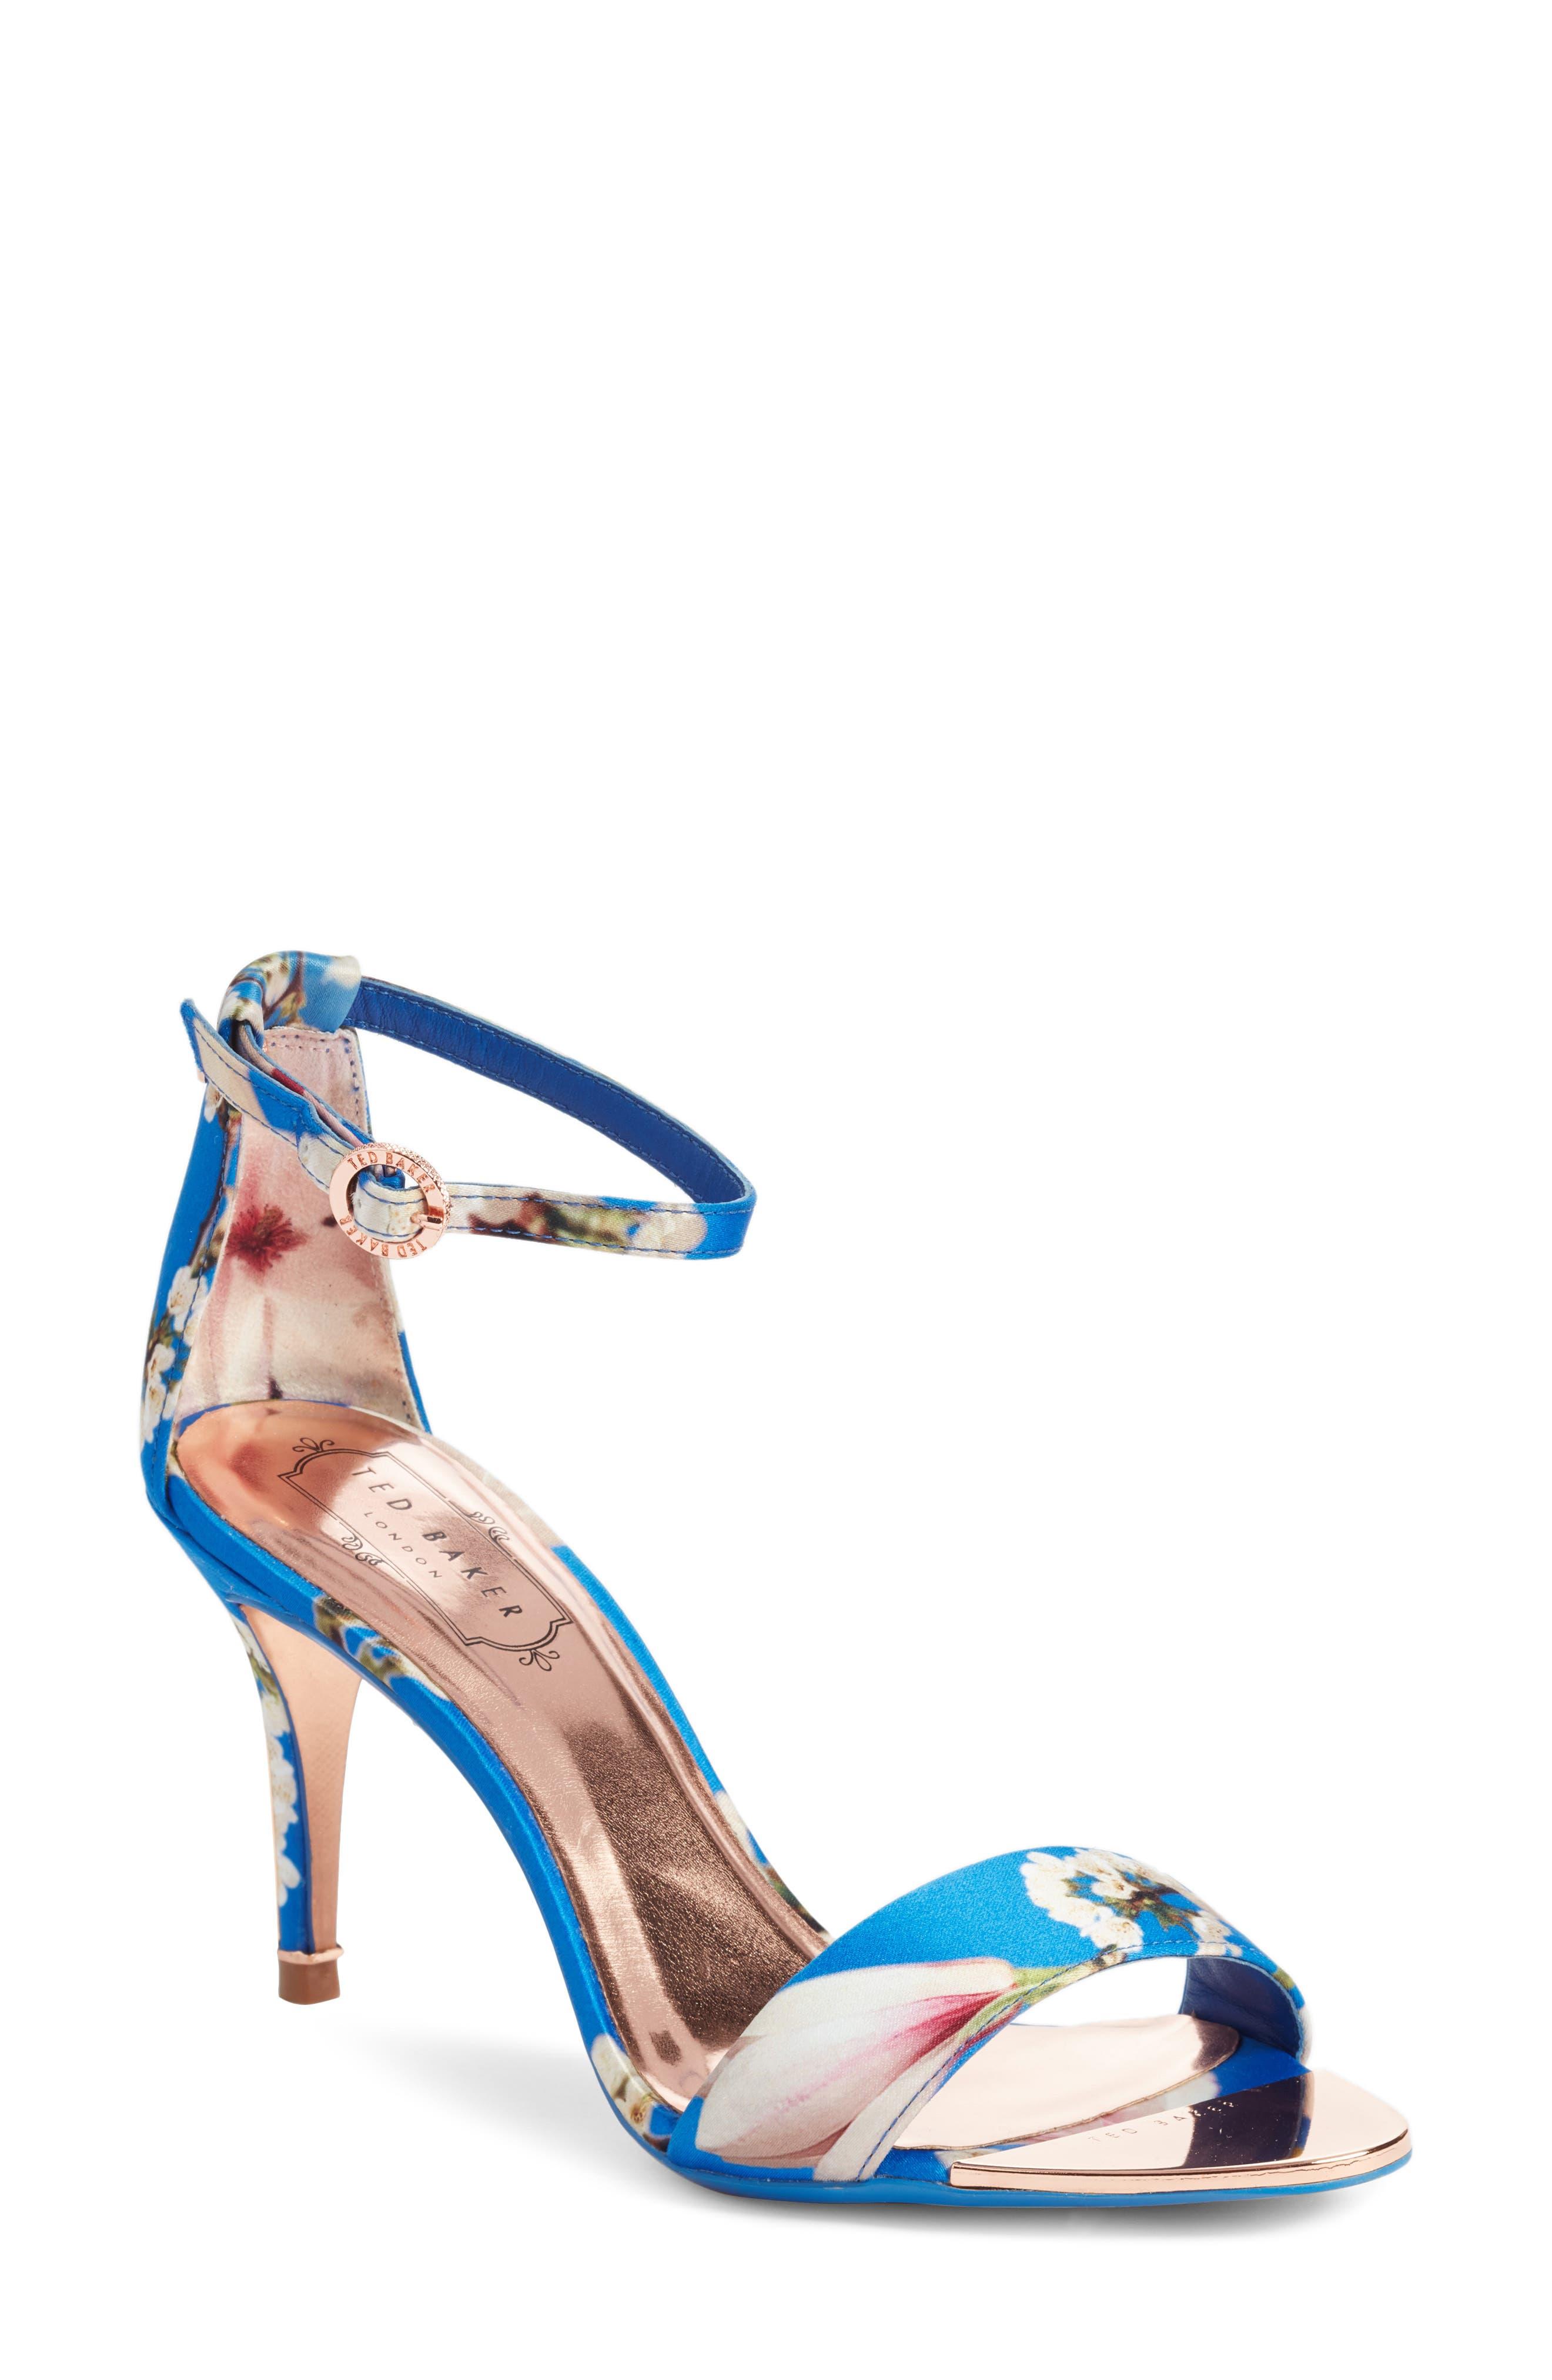 Mavbe Ankle Strap Sandal,                         Main,                         color, Blue Harmony Print